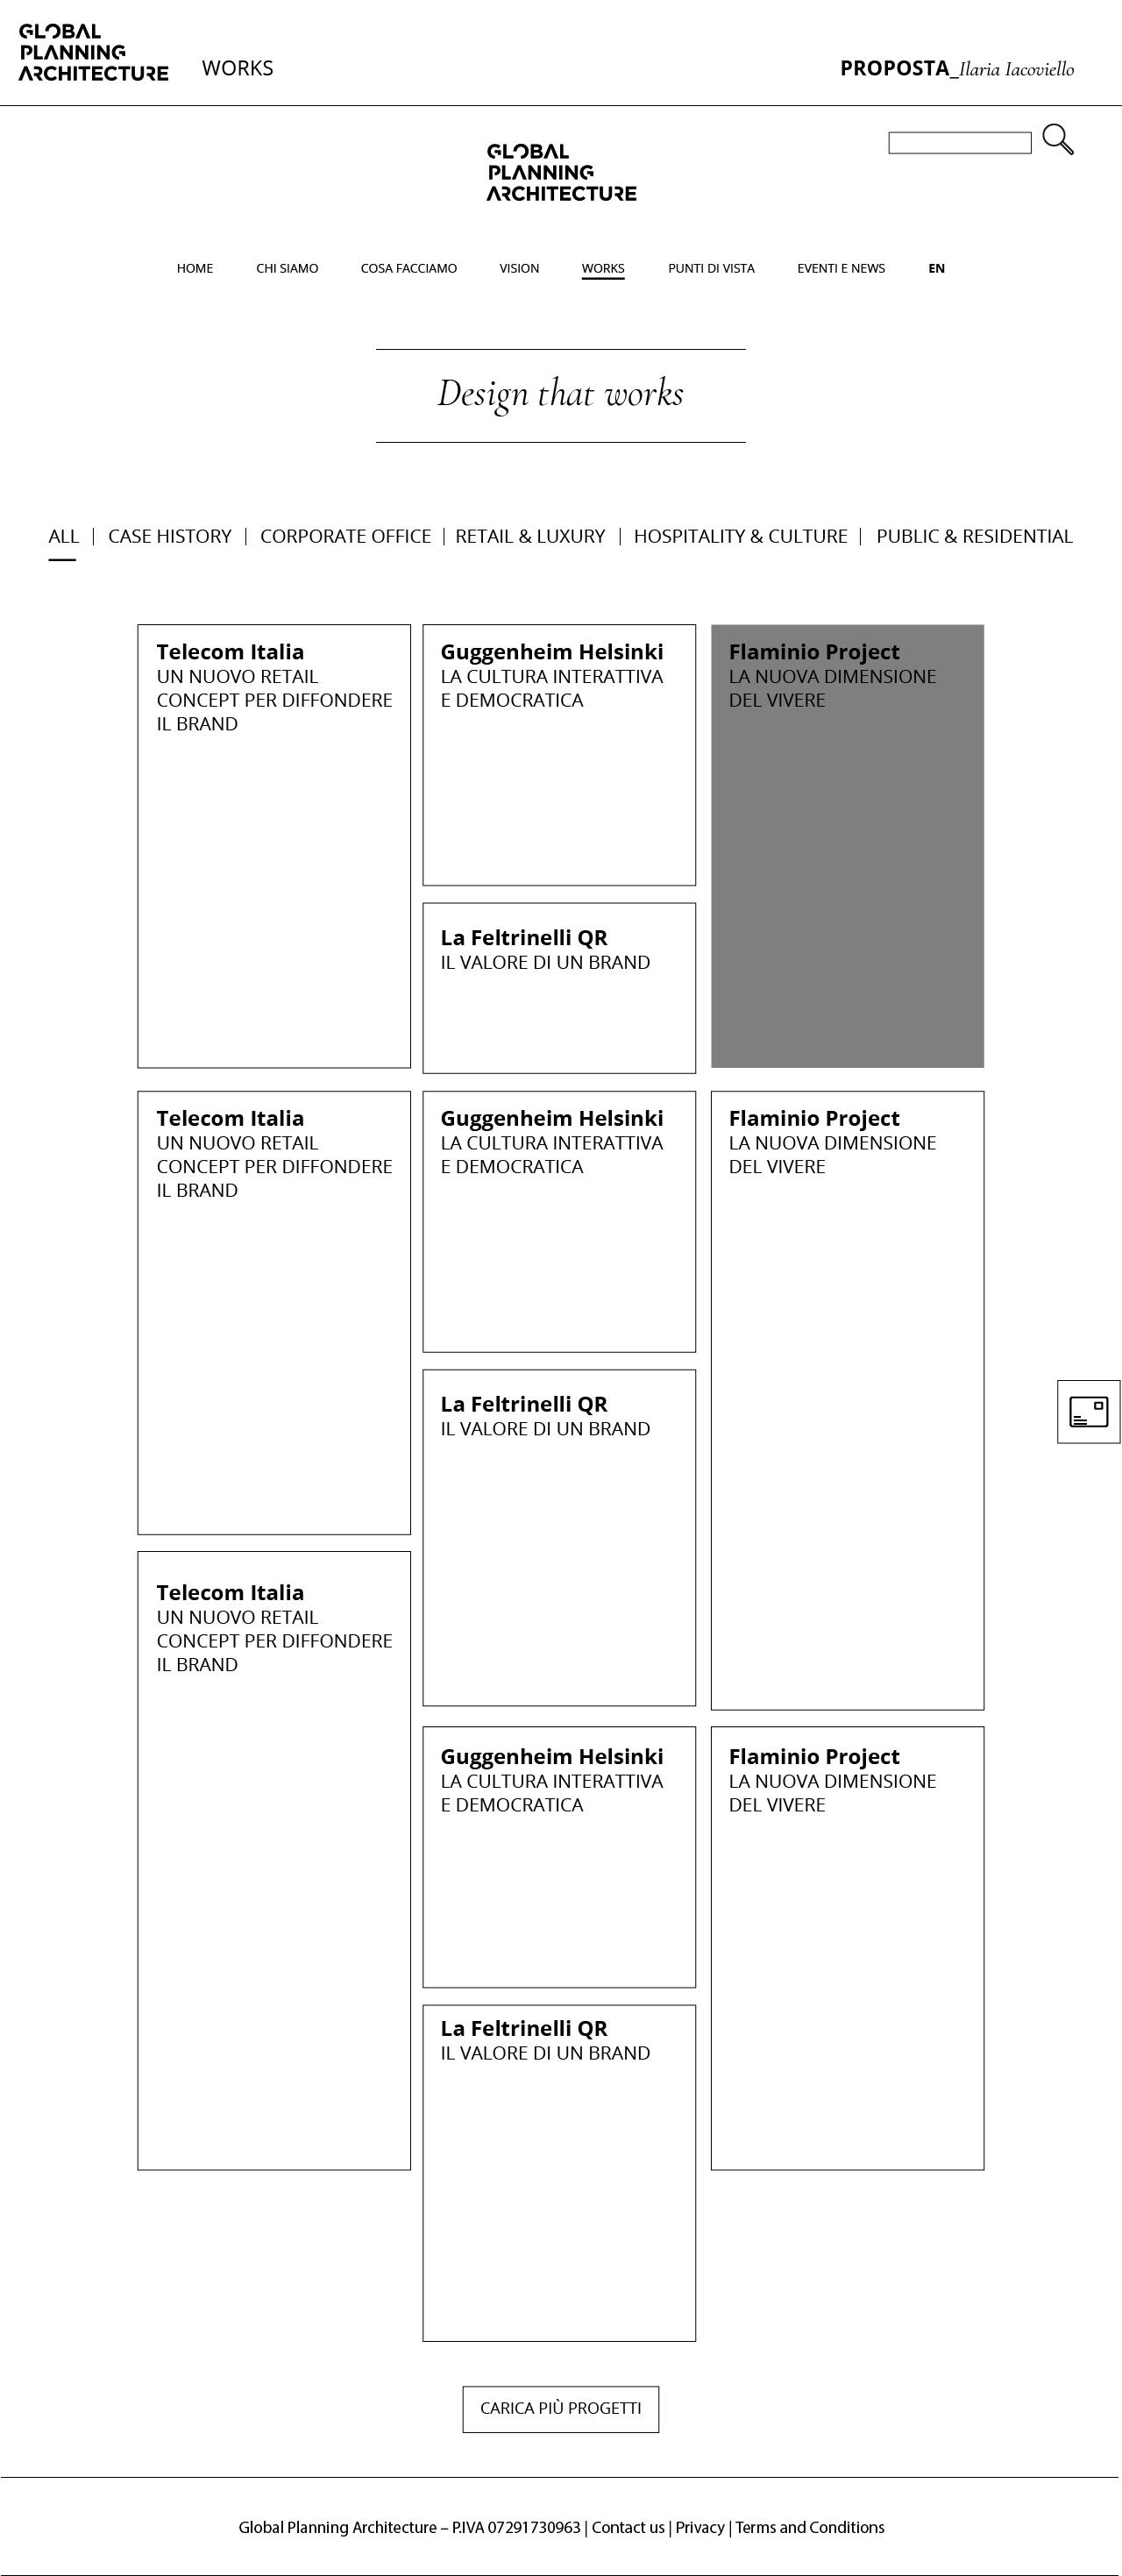 GPA_01_pagina_works.png